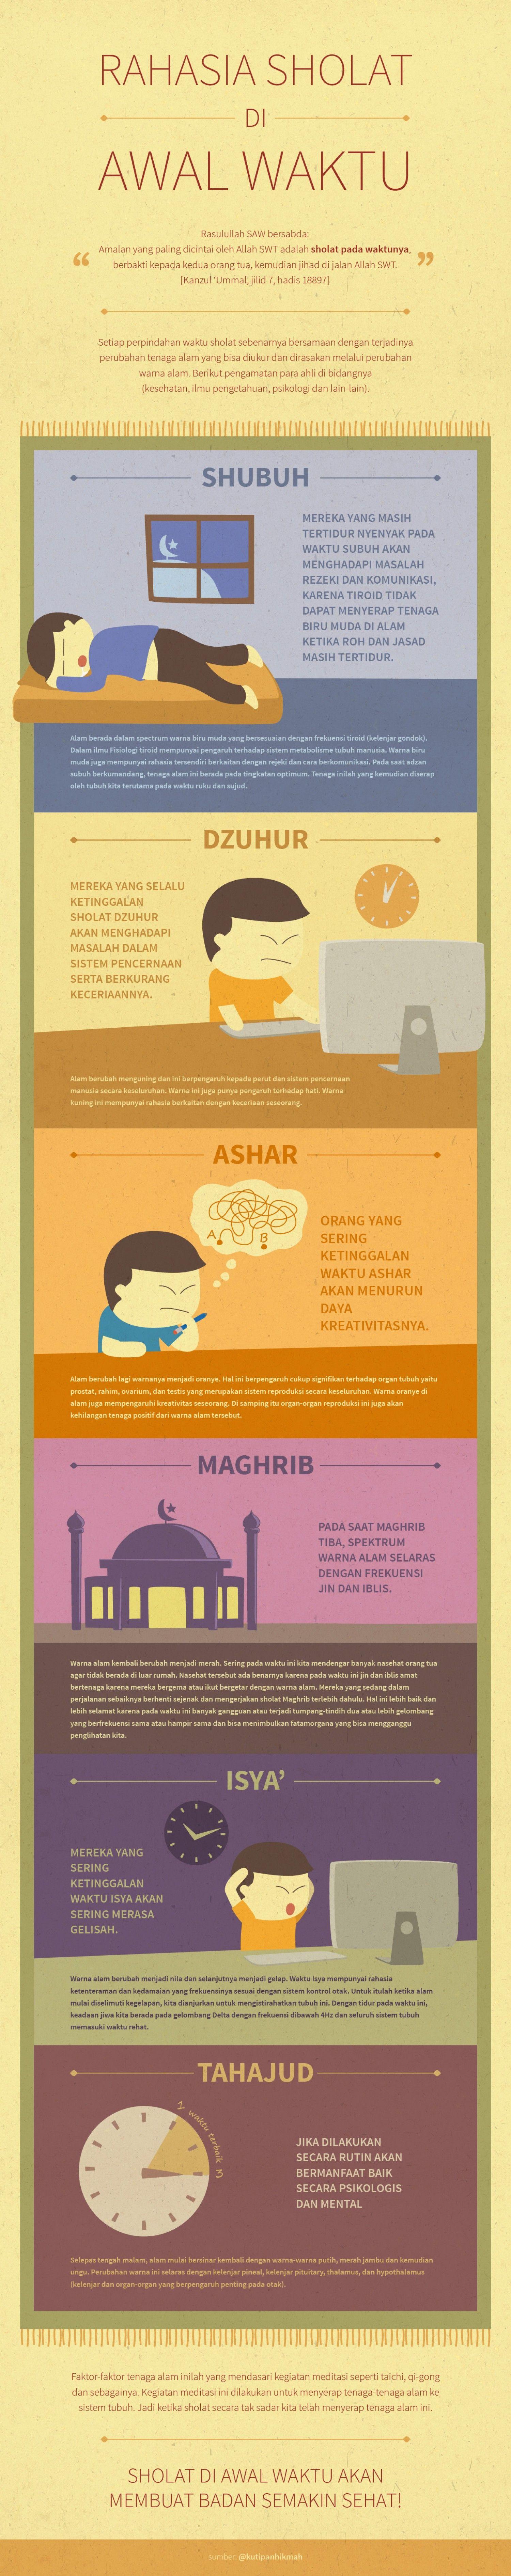 Rahasia Sholat Di Awal Waktu Infographic Kerohanian Sembahyang